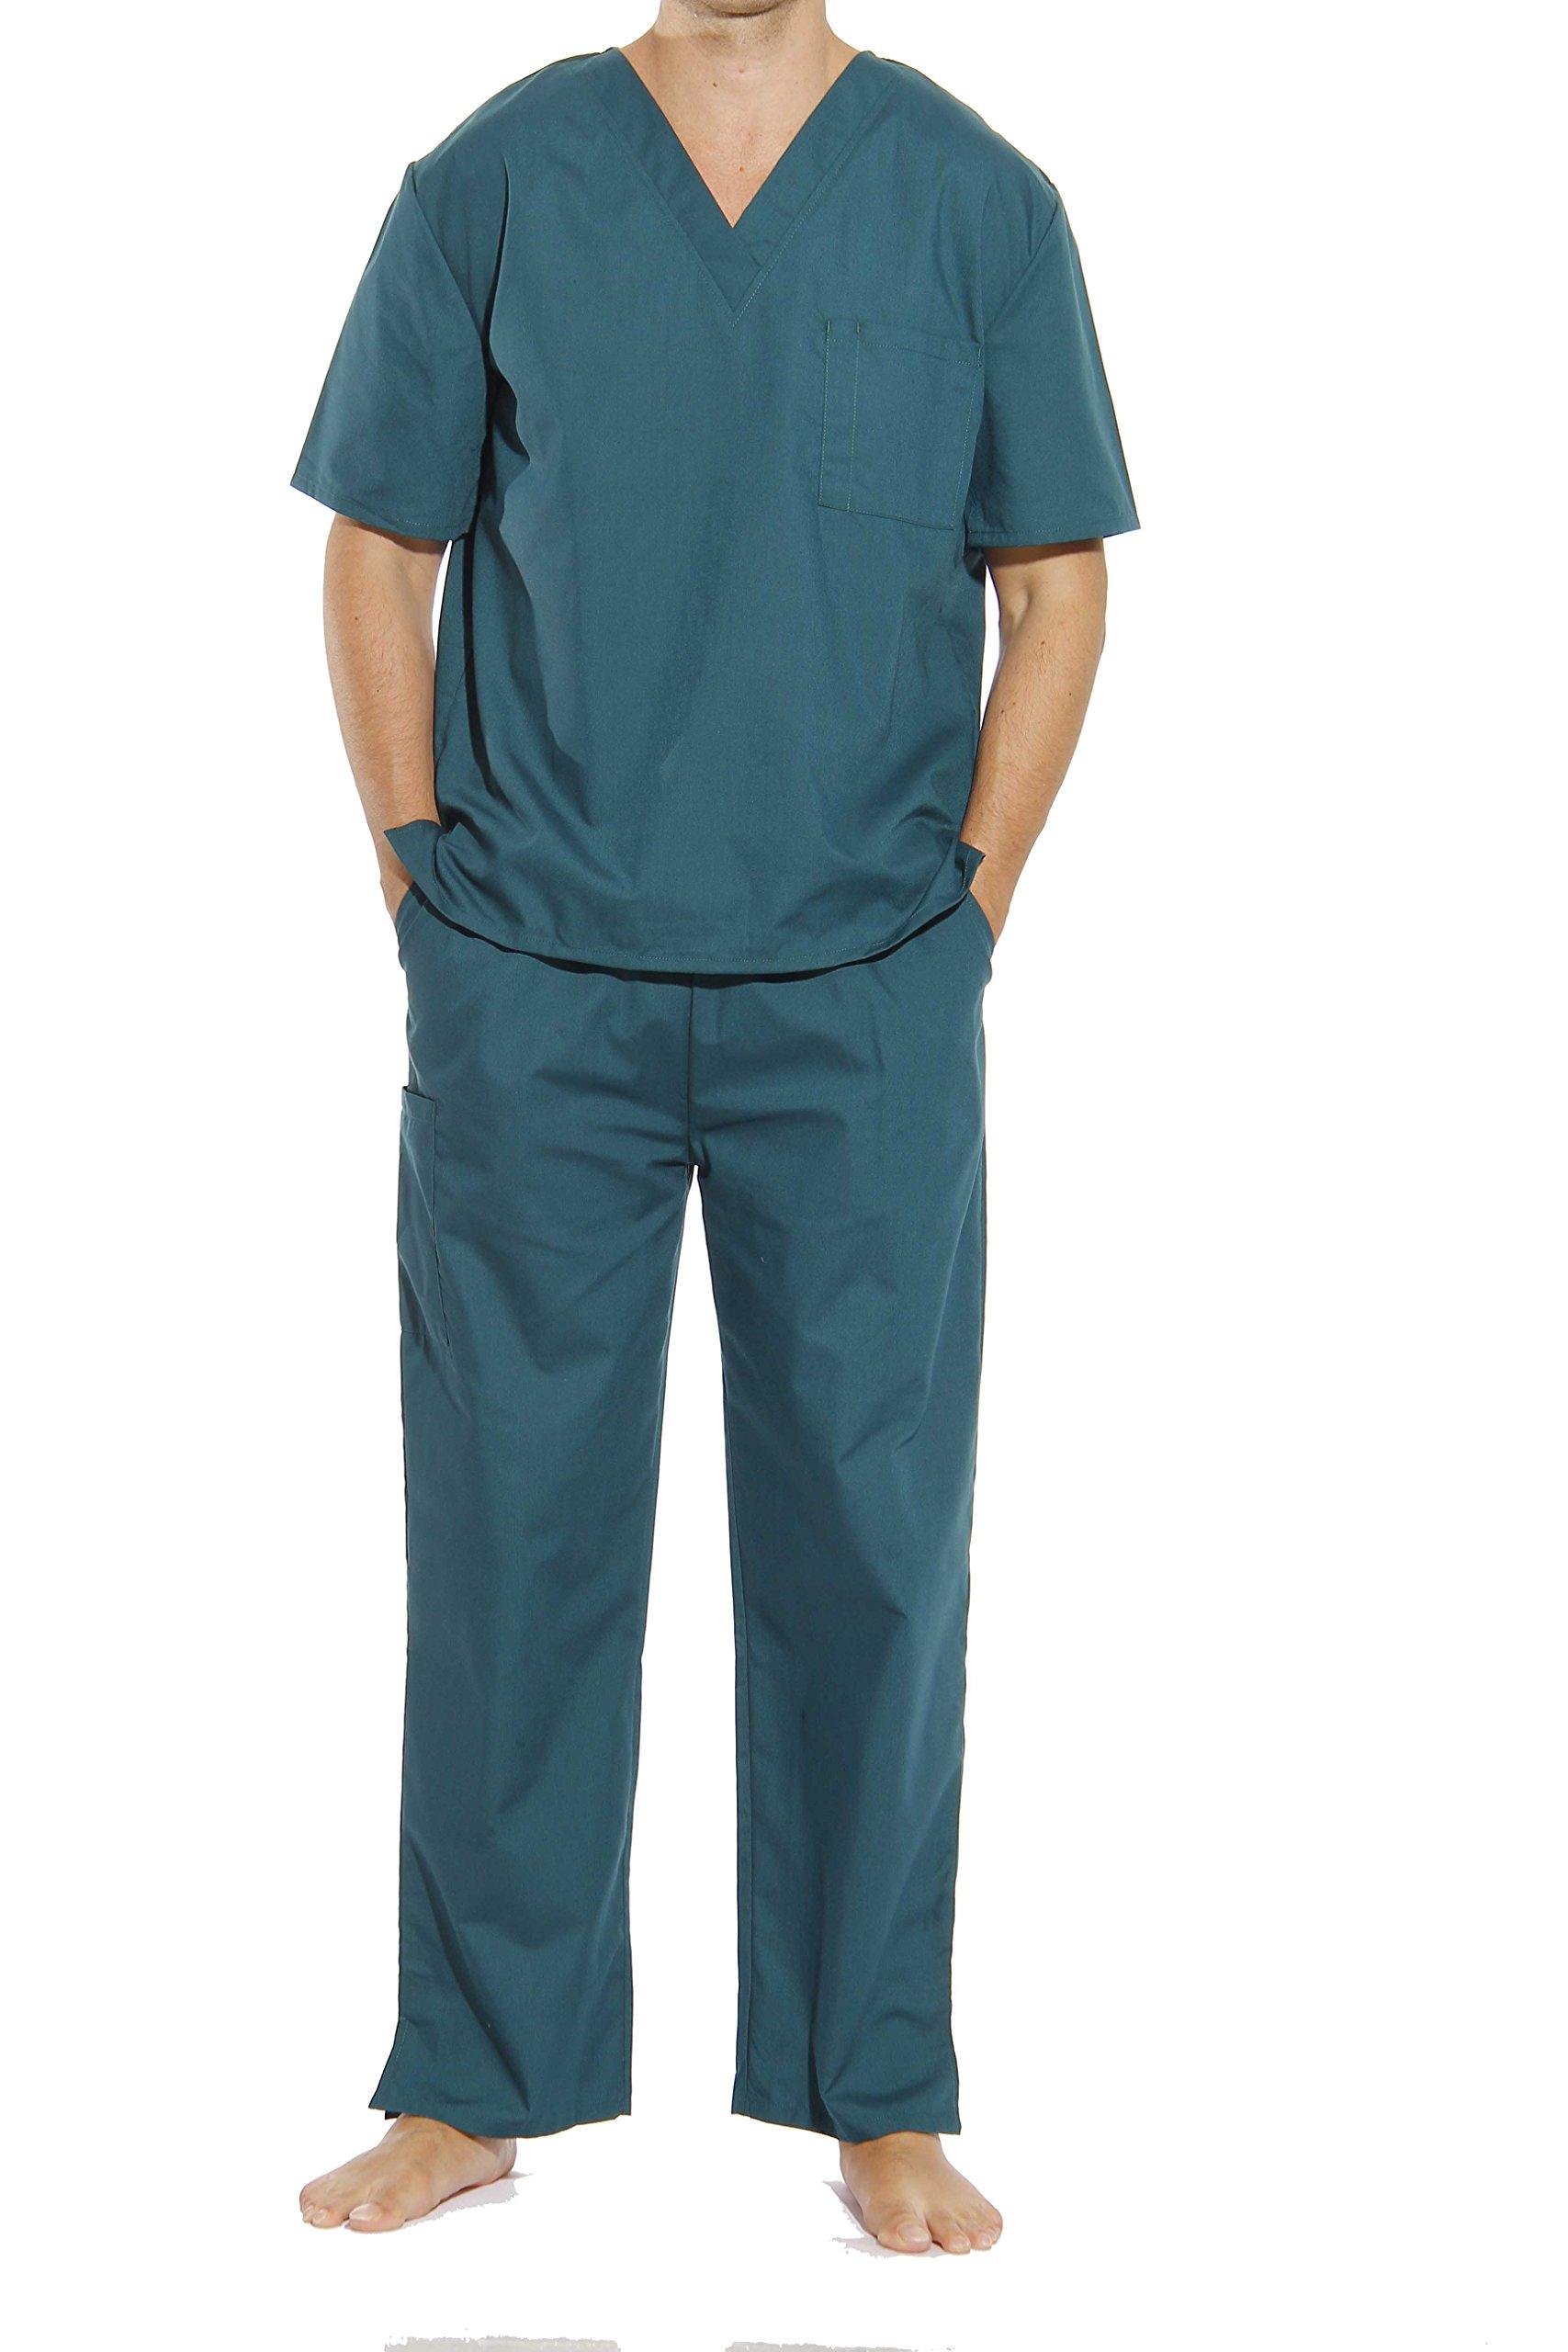 Tropi 33300M-Hunter-L Unisex Scrub Sets/Medical Scrubs/Nursing Scrubs